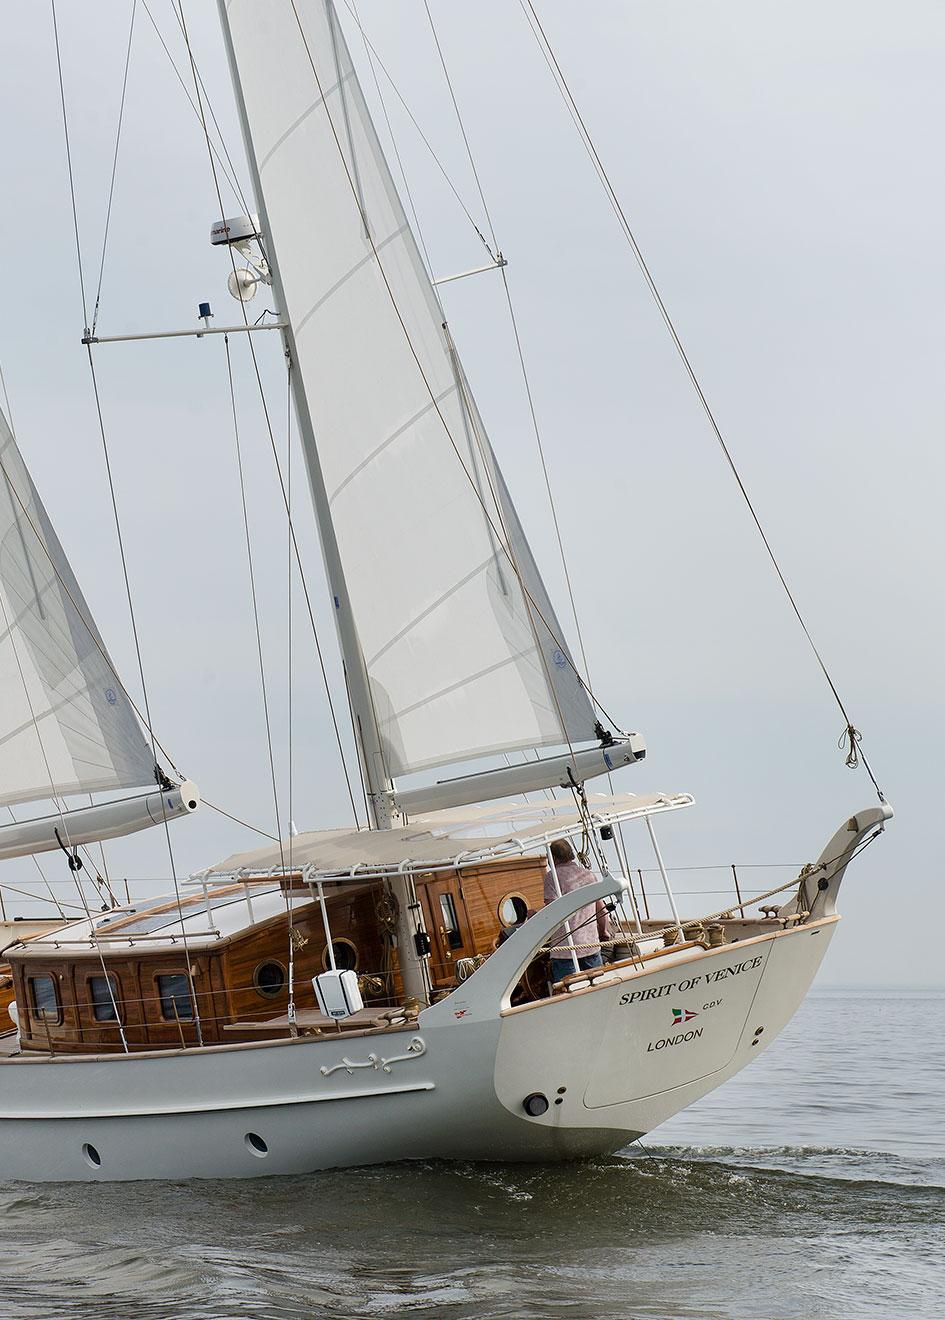 aft-view-of-the-gaff-rigged-sailing-superyacht-spirit-of-venice-credit-olivier-van-meer-vmg-yachtbuilders